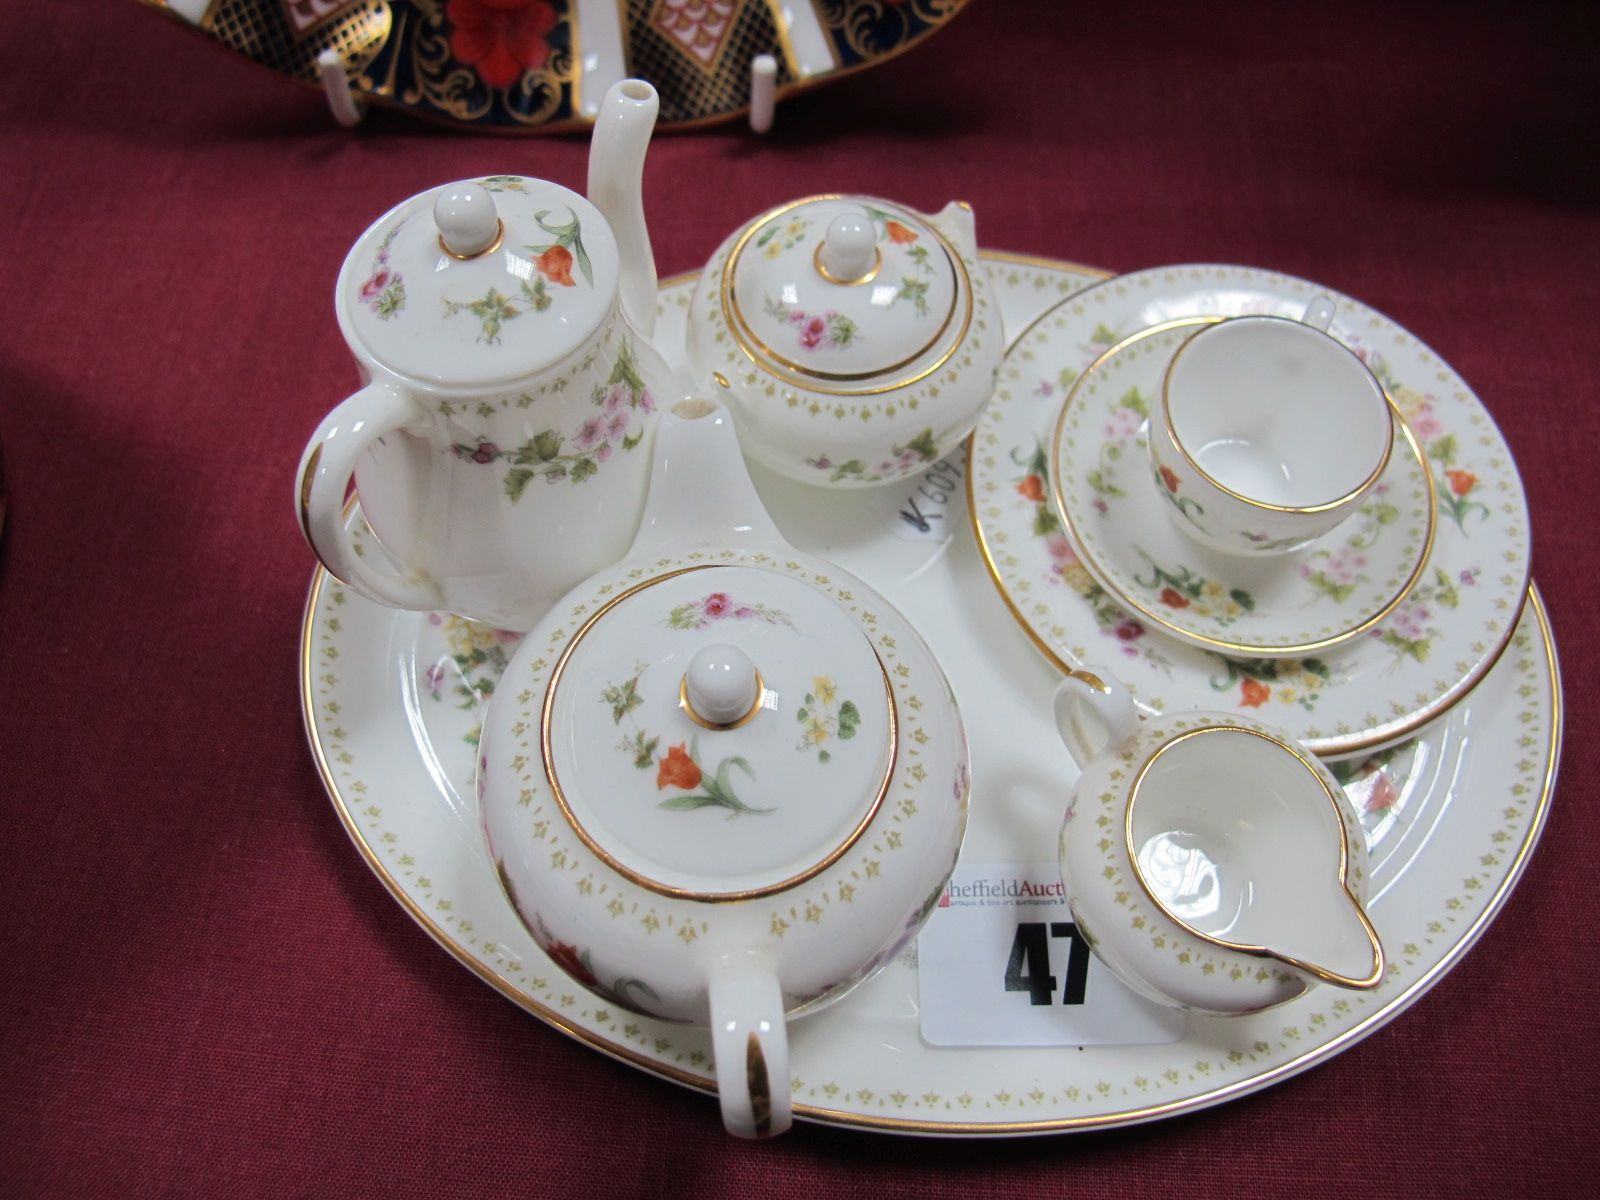 Lot 47 - A Wedgwood Bone China Miniature Four Piece Tea Set, matching trio and oval tray. (8)